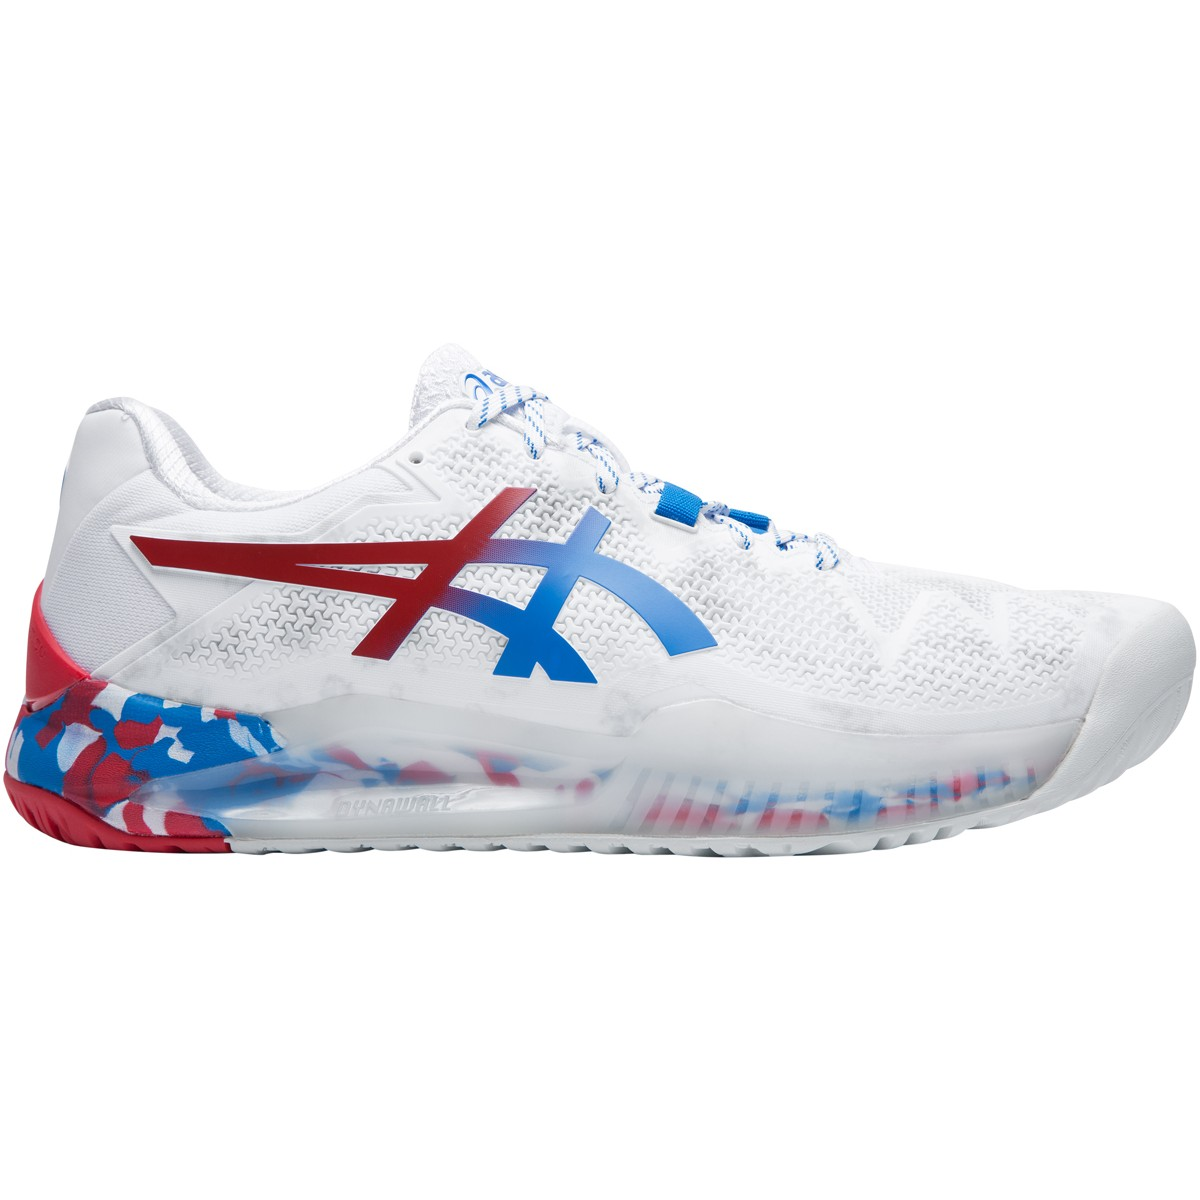 mens mizuno running shoes size 9.5 eu west australian value